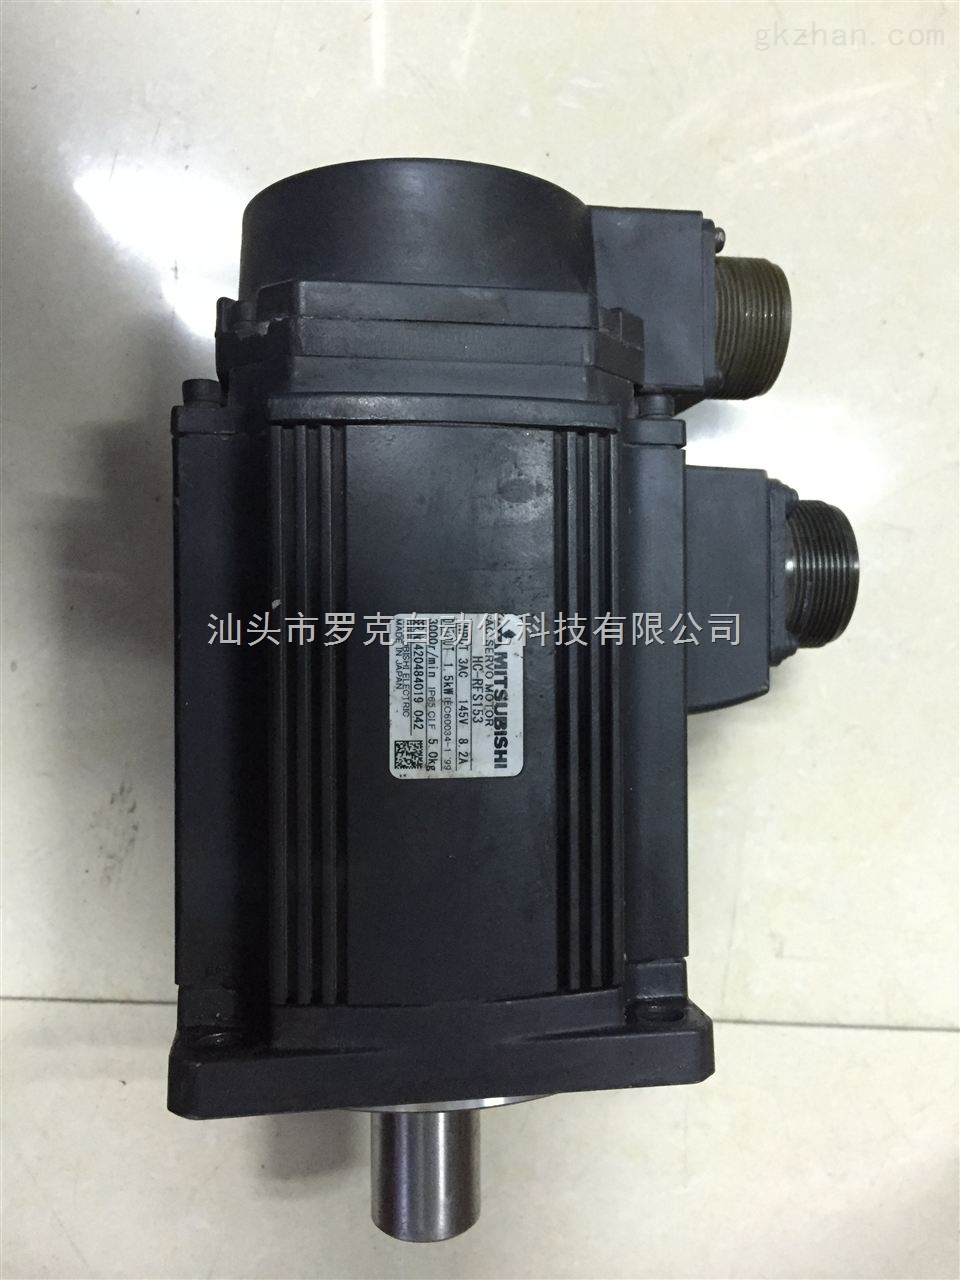 HC-UFS13BK-S11三菱伺服�R�_�N售可�S修